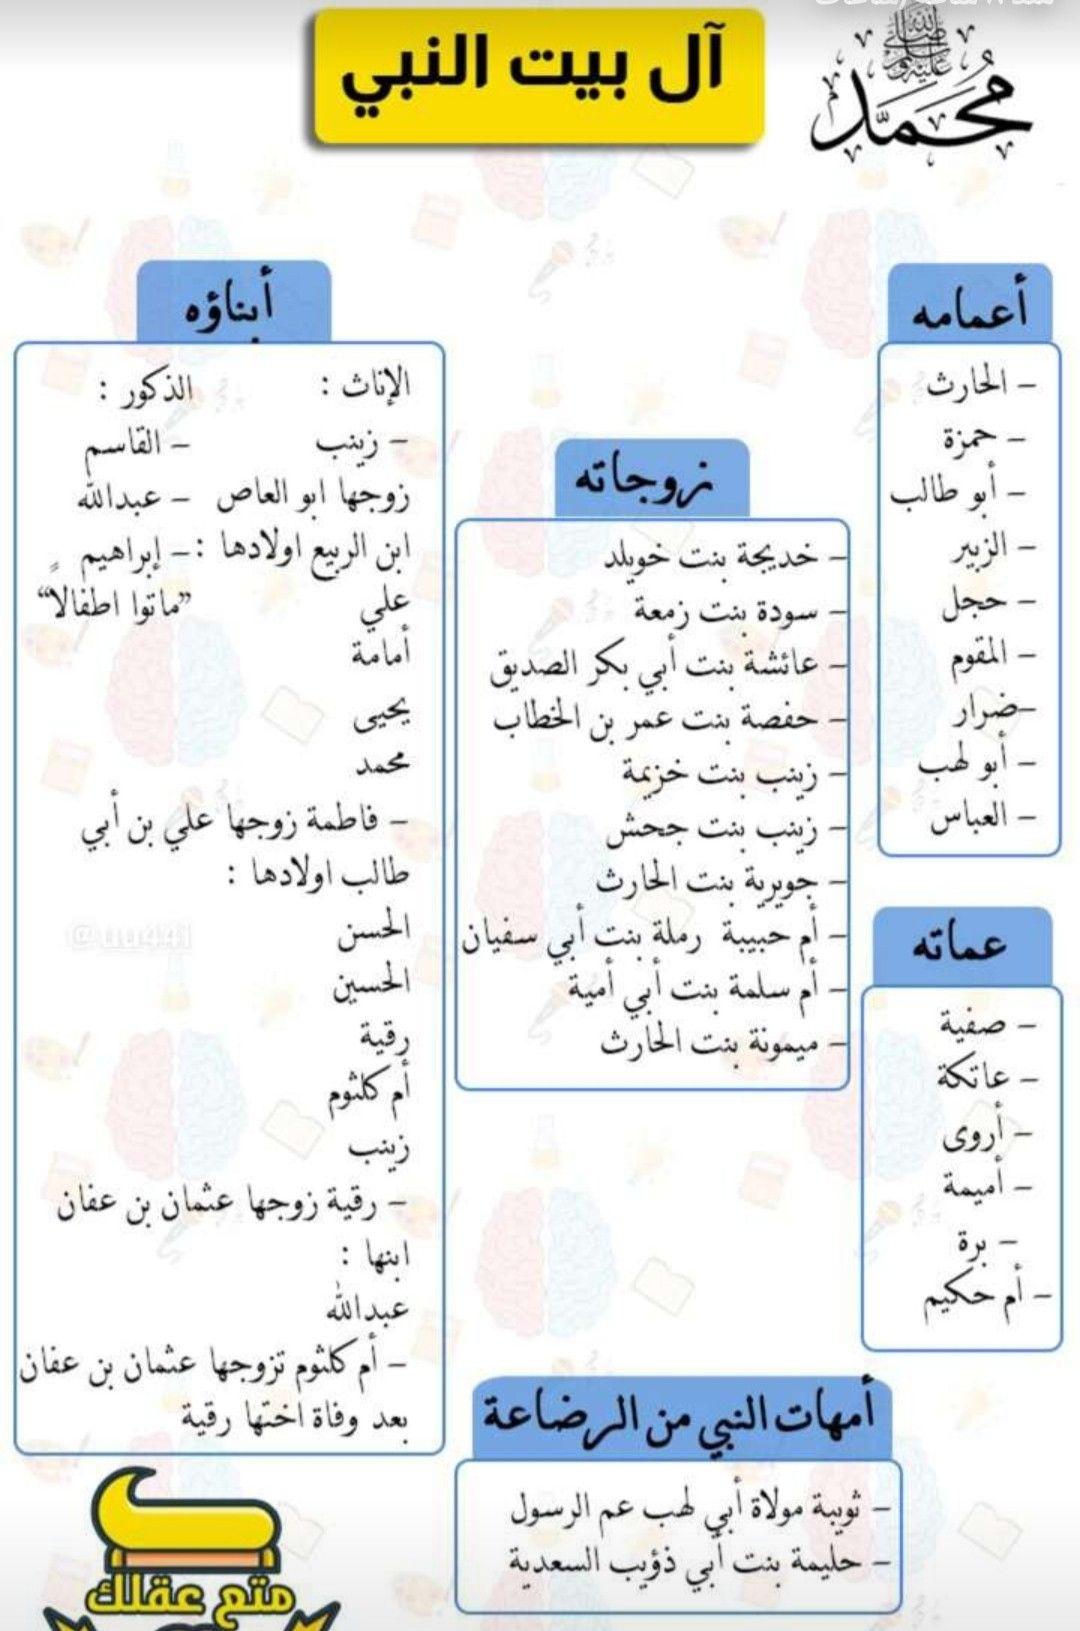 Pin By Mohammed Al Harbi On اسلاميات Map Bullet Journal Map Screenshot